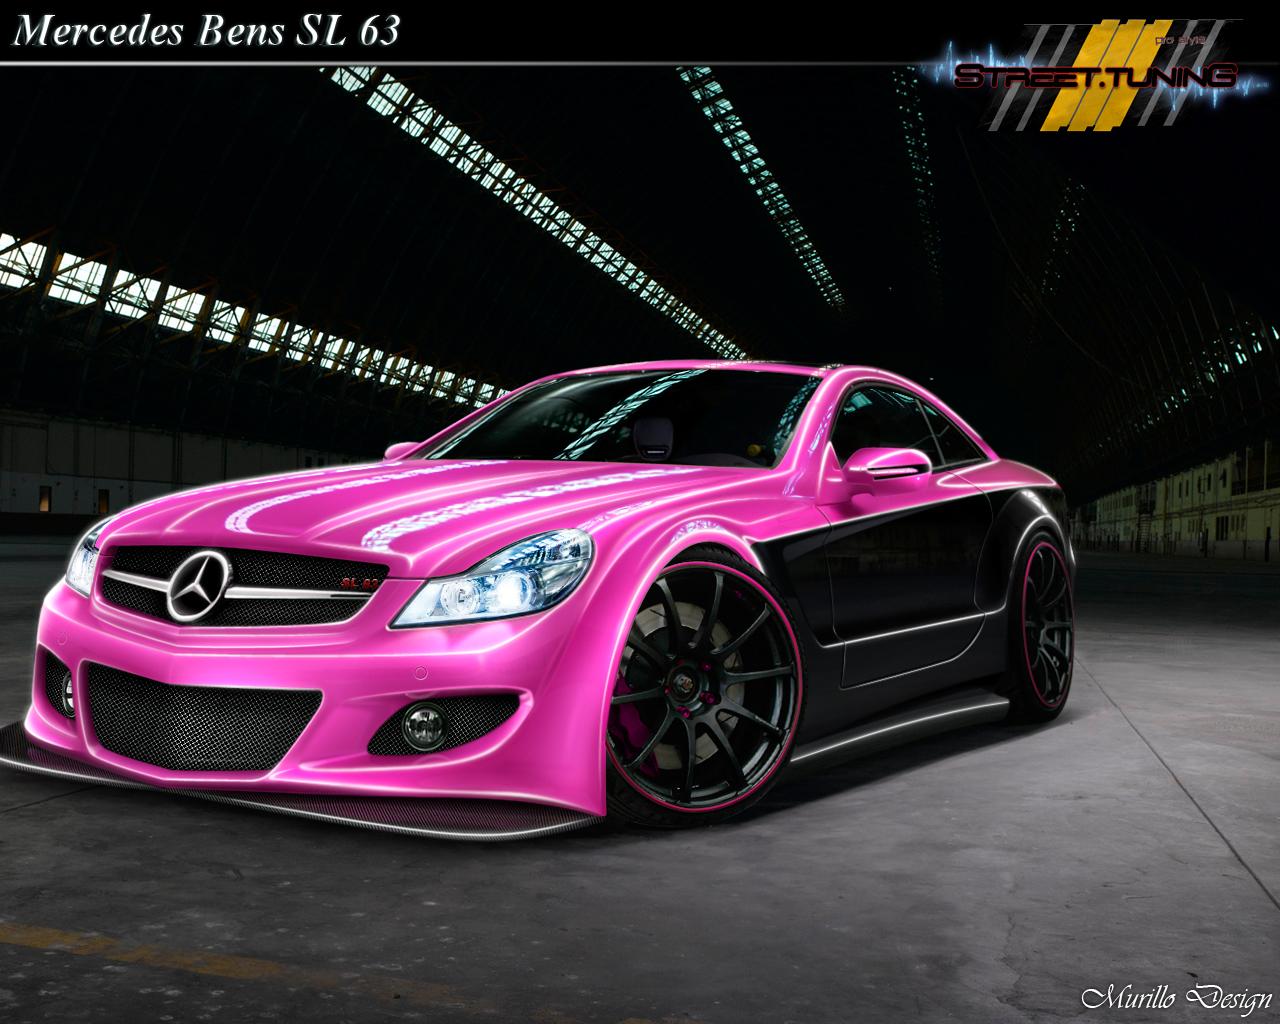 Mercedes sl 63 pink by murillodesign on deviantart for Pink mercedes benz